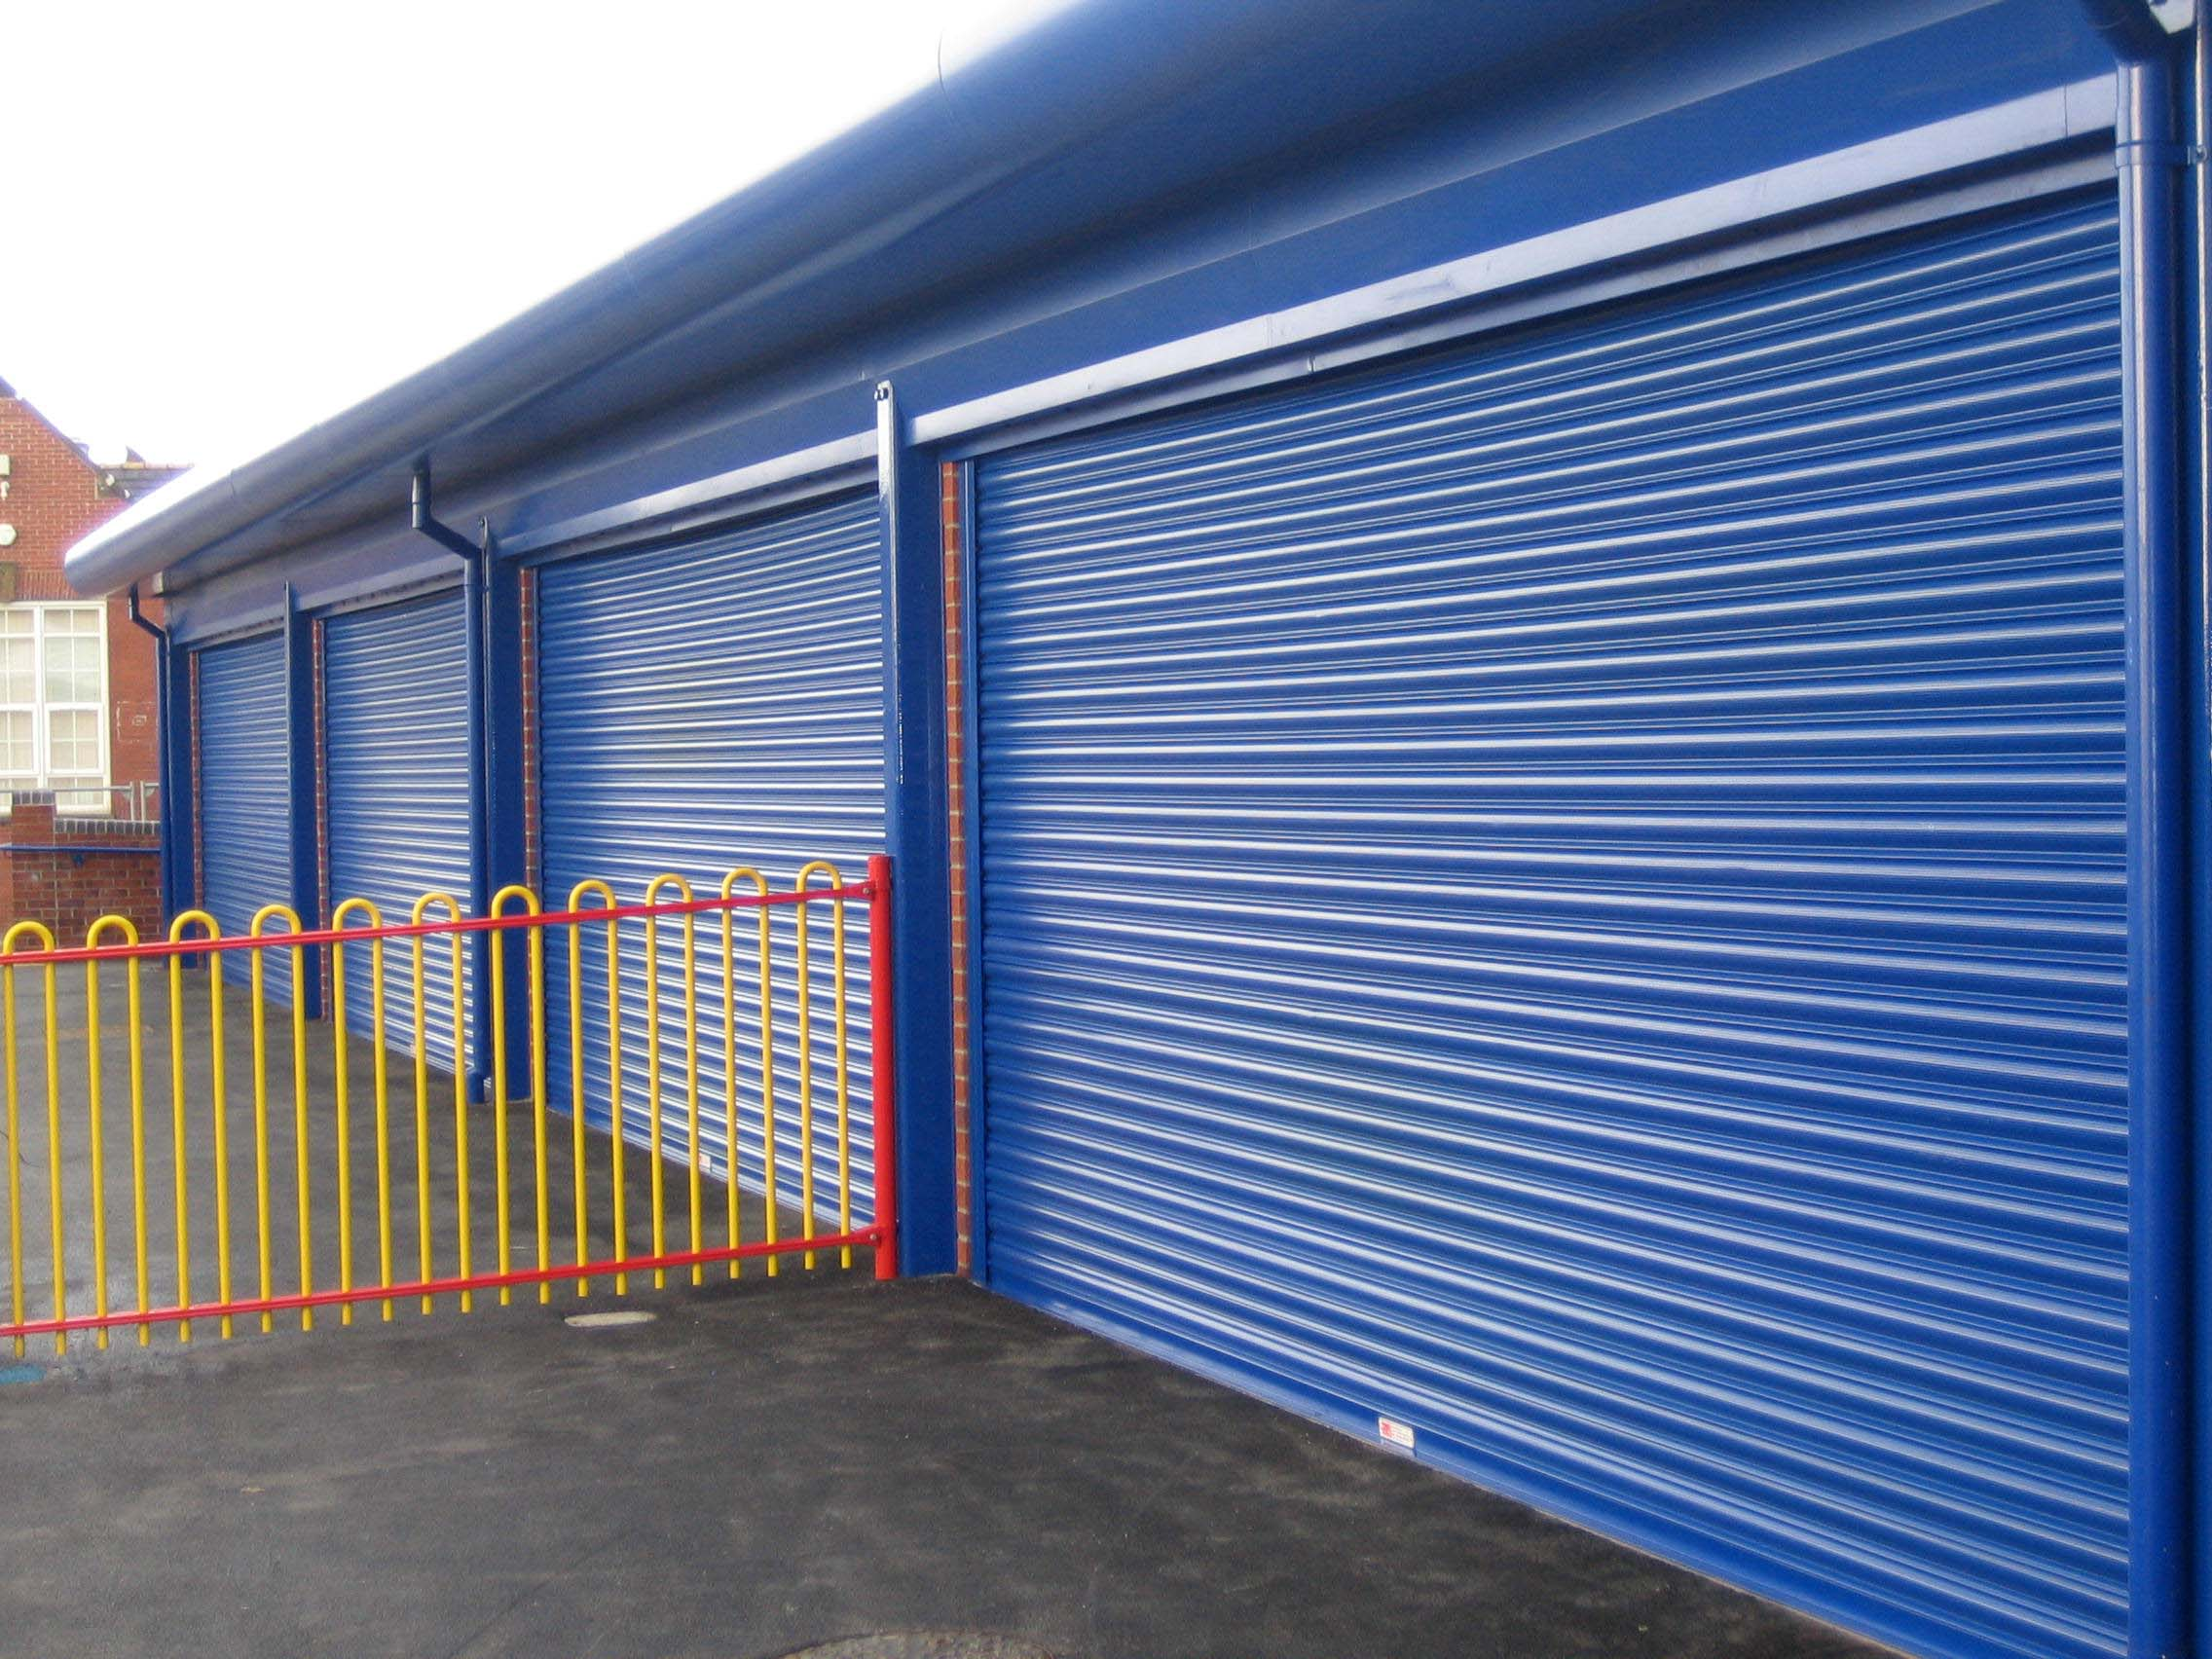 School security shutters